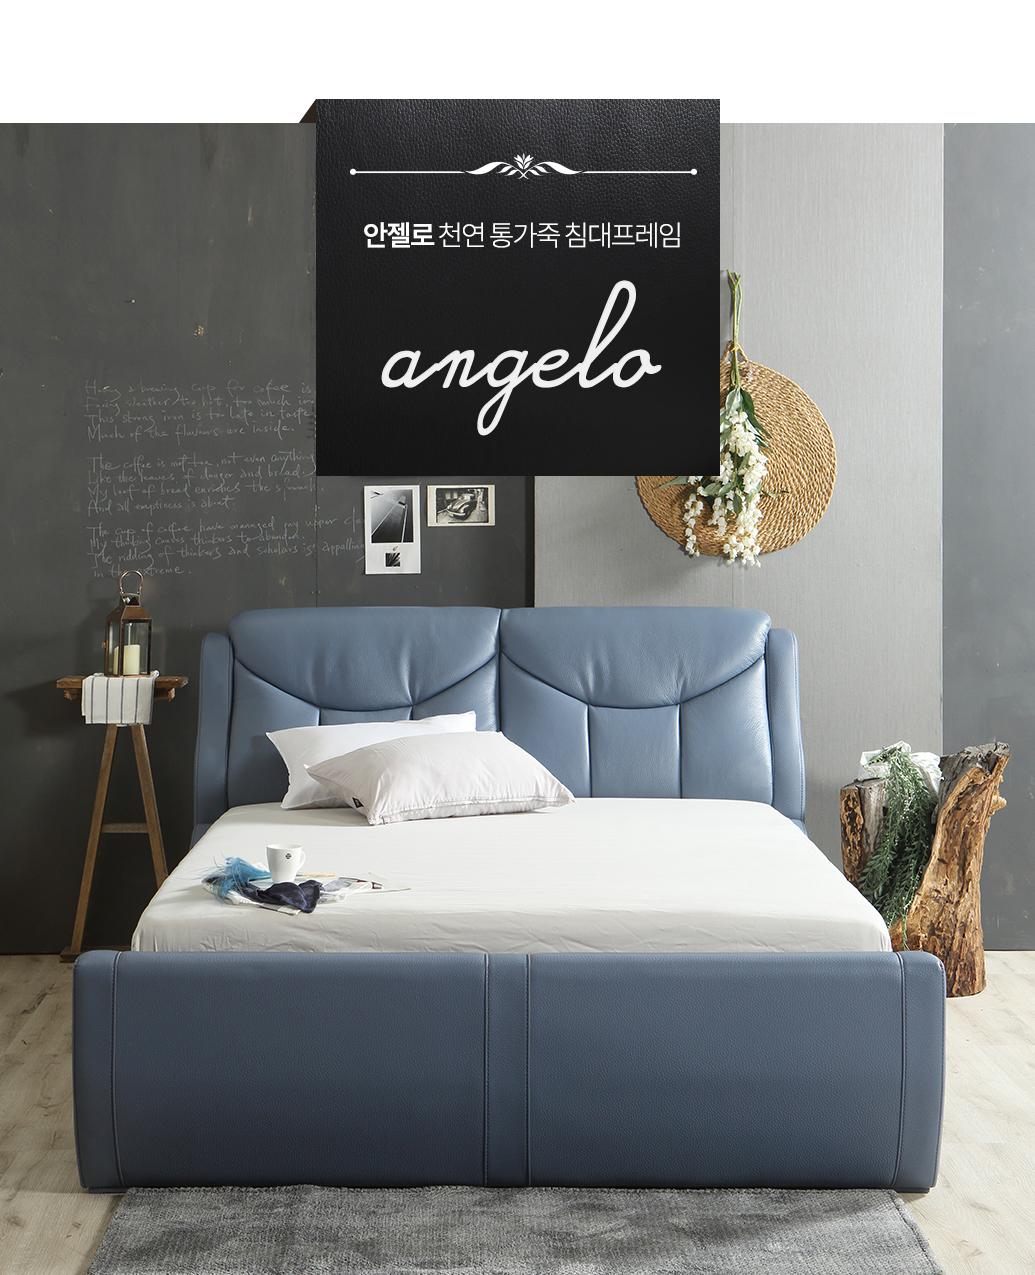 angelo01.jpg